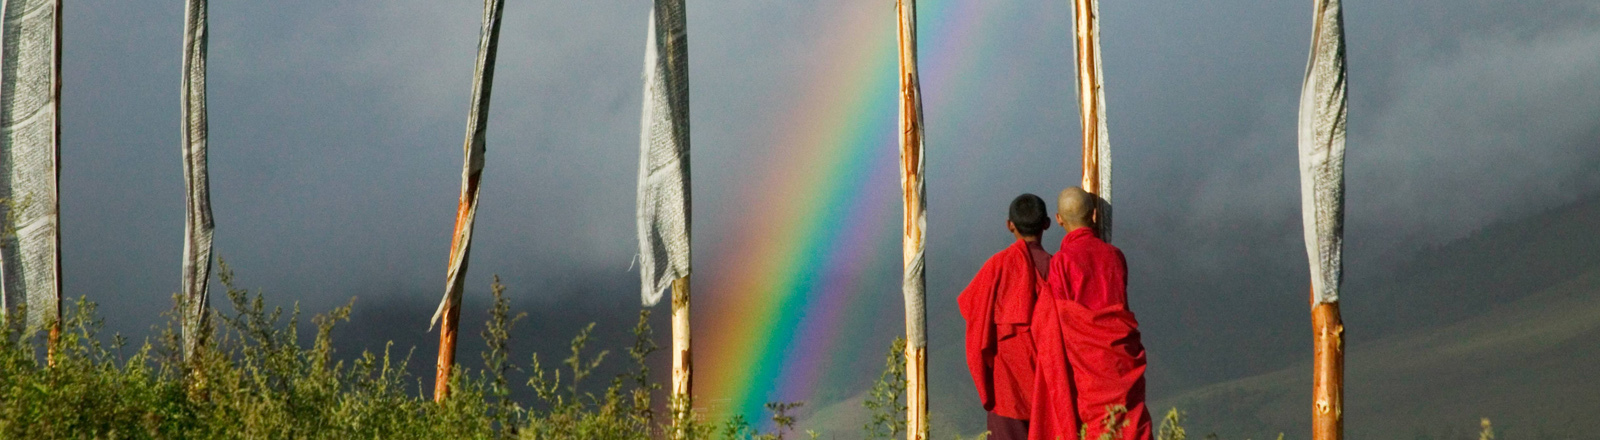 Regenbogen über dem Dorf Gangtey in Bhutan